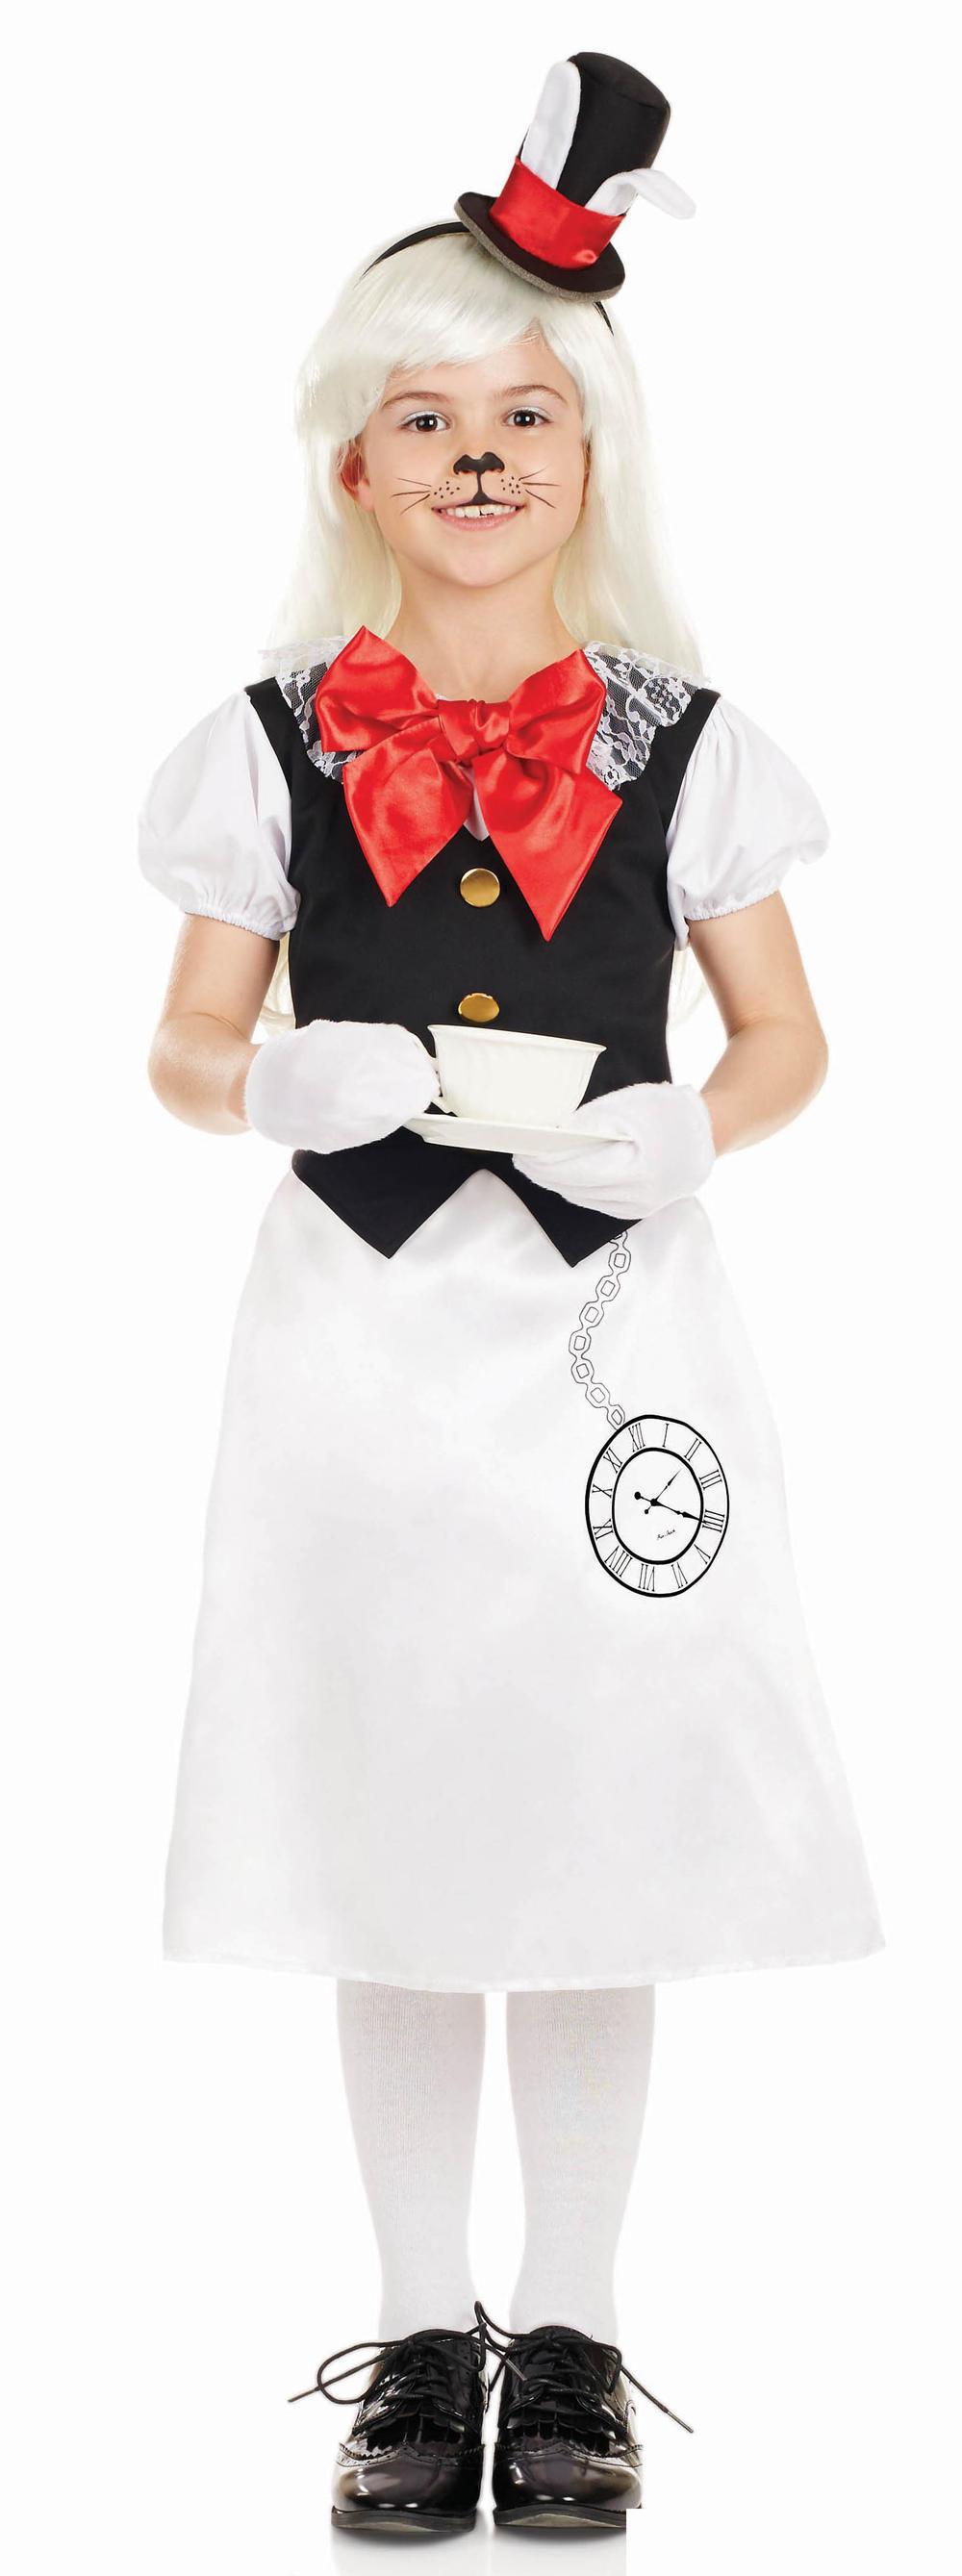 Miss White Rabbit Girls Fancy Dress Wonderland Fairy Tale Book Day Kids Costume